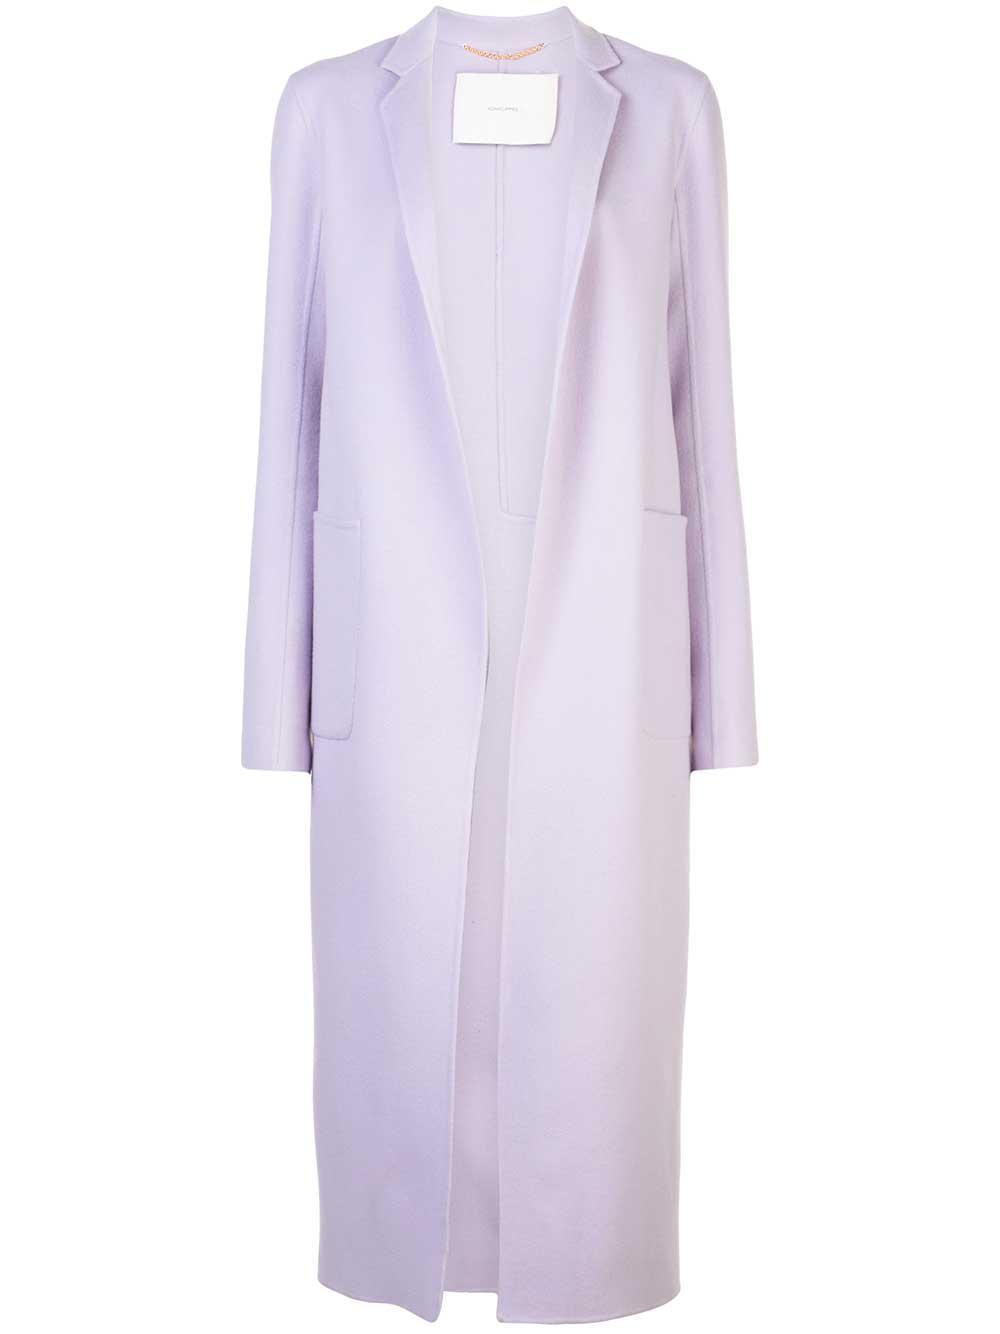 Angora Wool Menswear Coat